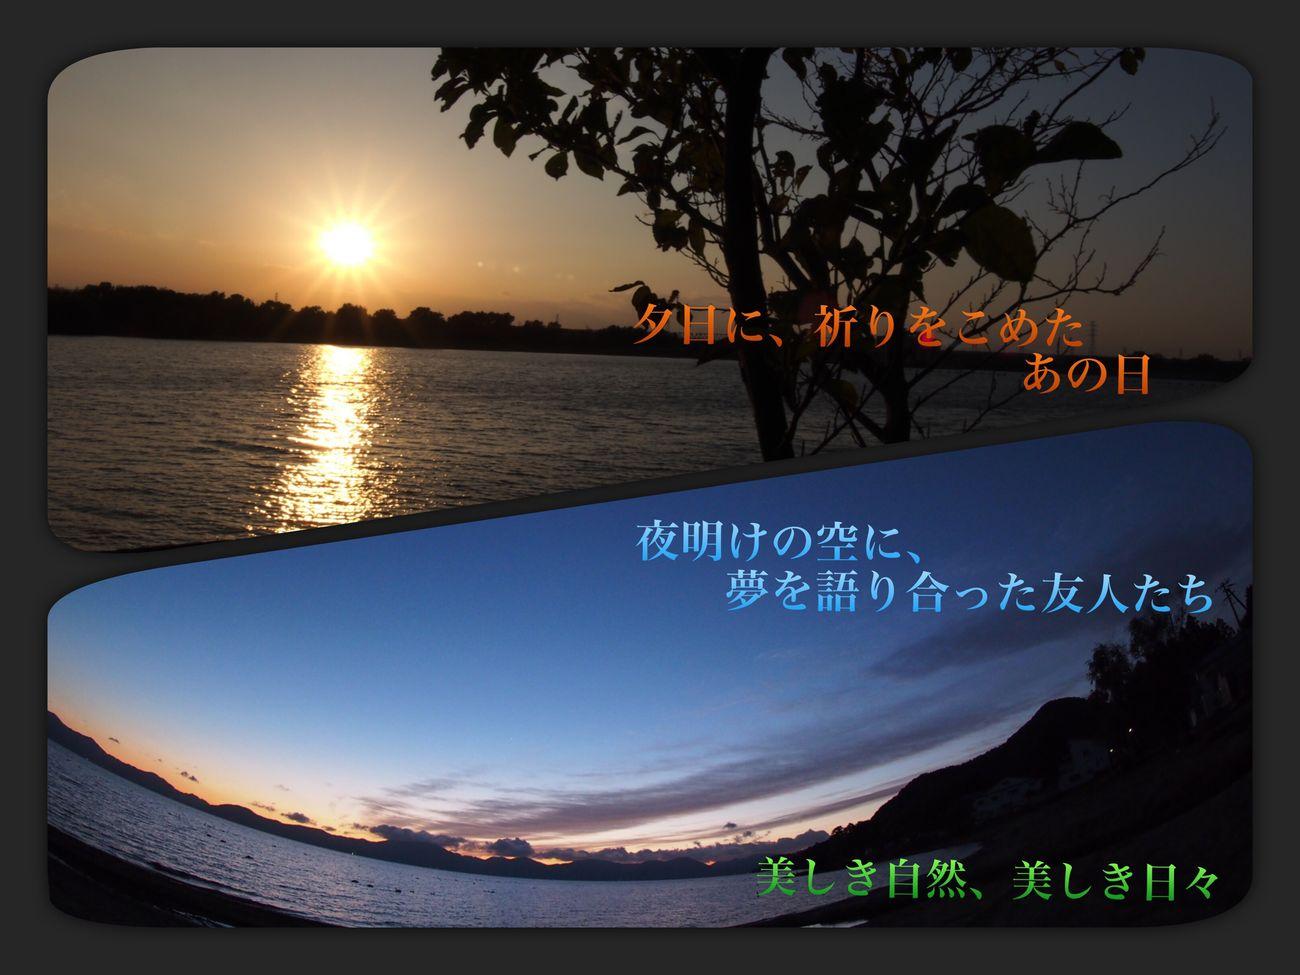 (上)2016.10.20 埼玉県 彩湖    (下)2016.10.24 会津 猪苗代湖         ・ 1ページマガジン